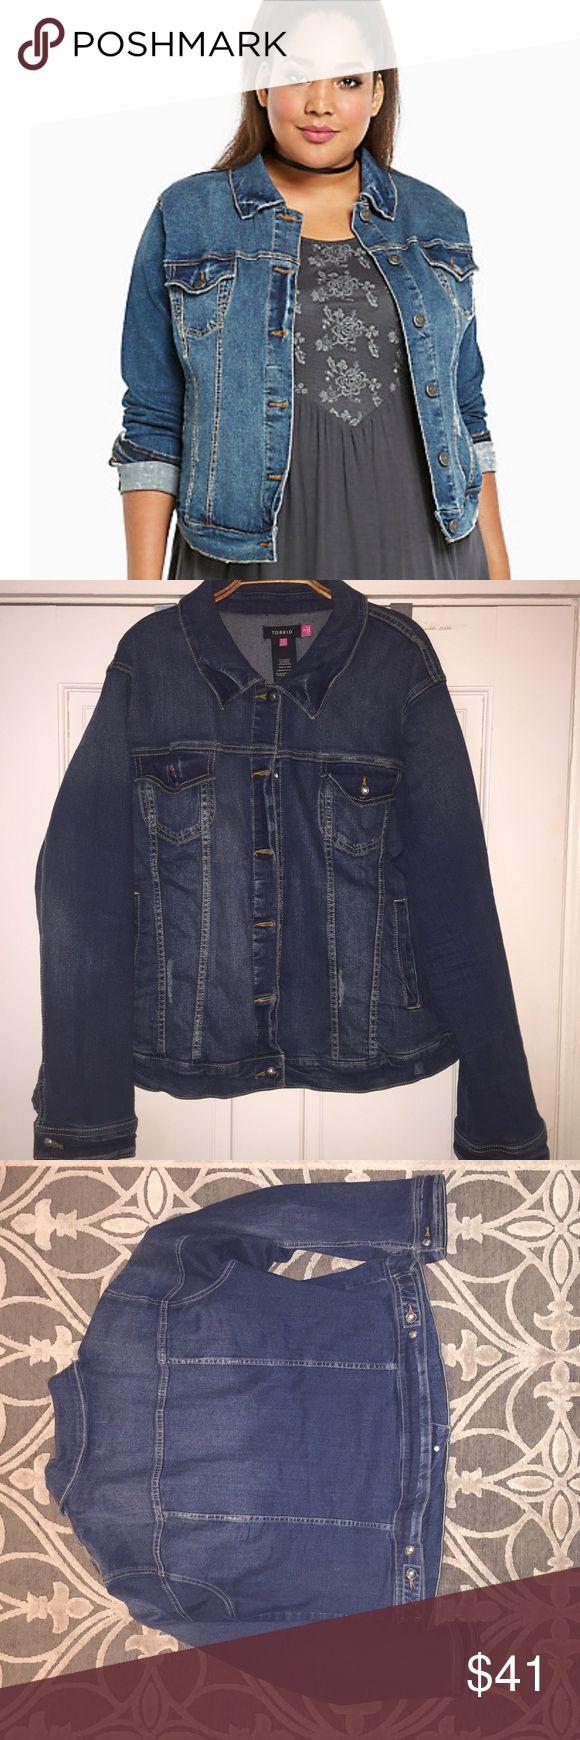 Distressed denim jacket EUC: Lightly distressed denim jacket. Cotton/Spandex material gives the jacket a comfortable fit. torrid Jackets & Coats Jean Jackets